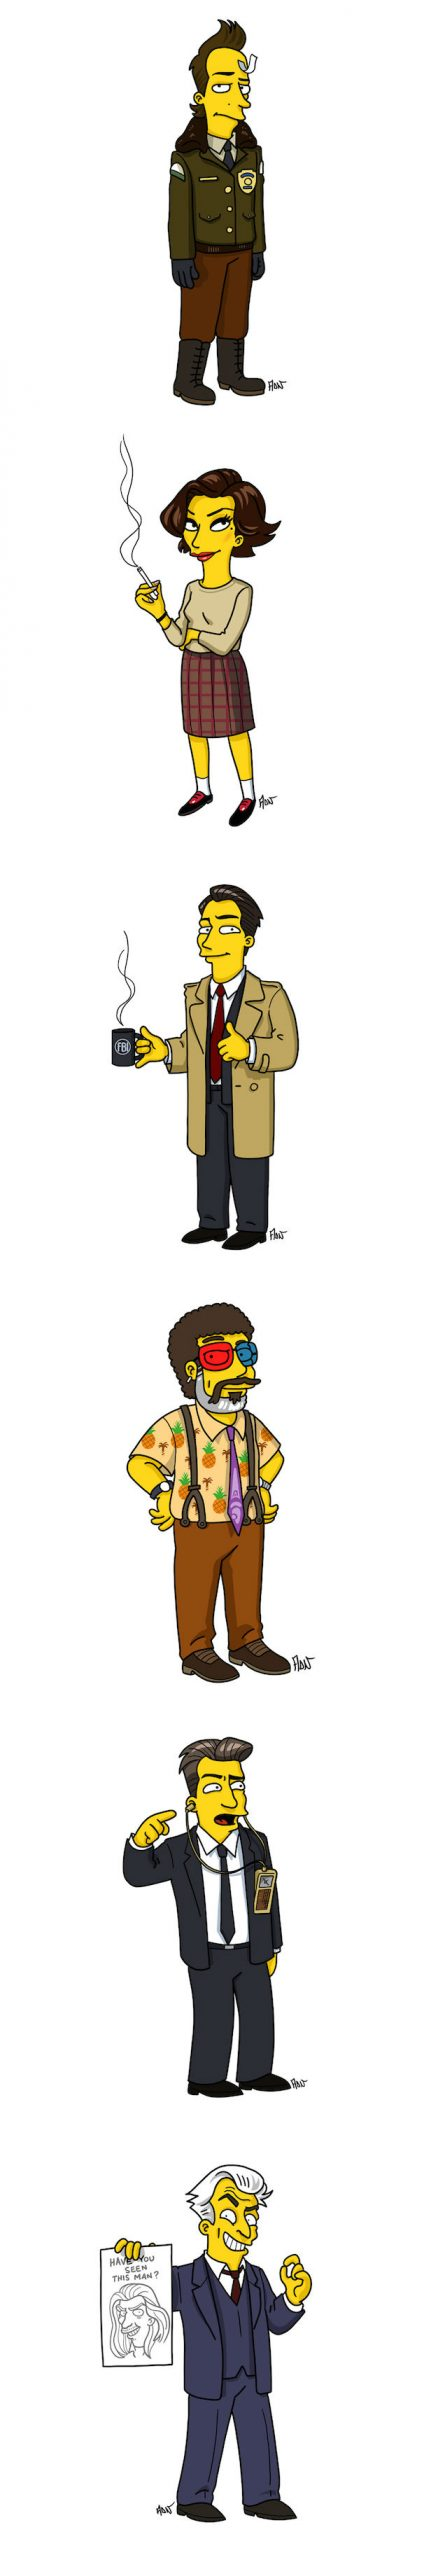 simpsonized-twin-peaks-characters (3)